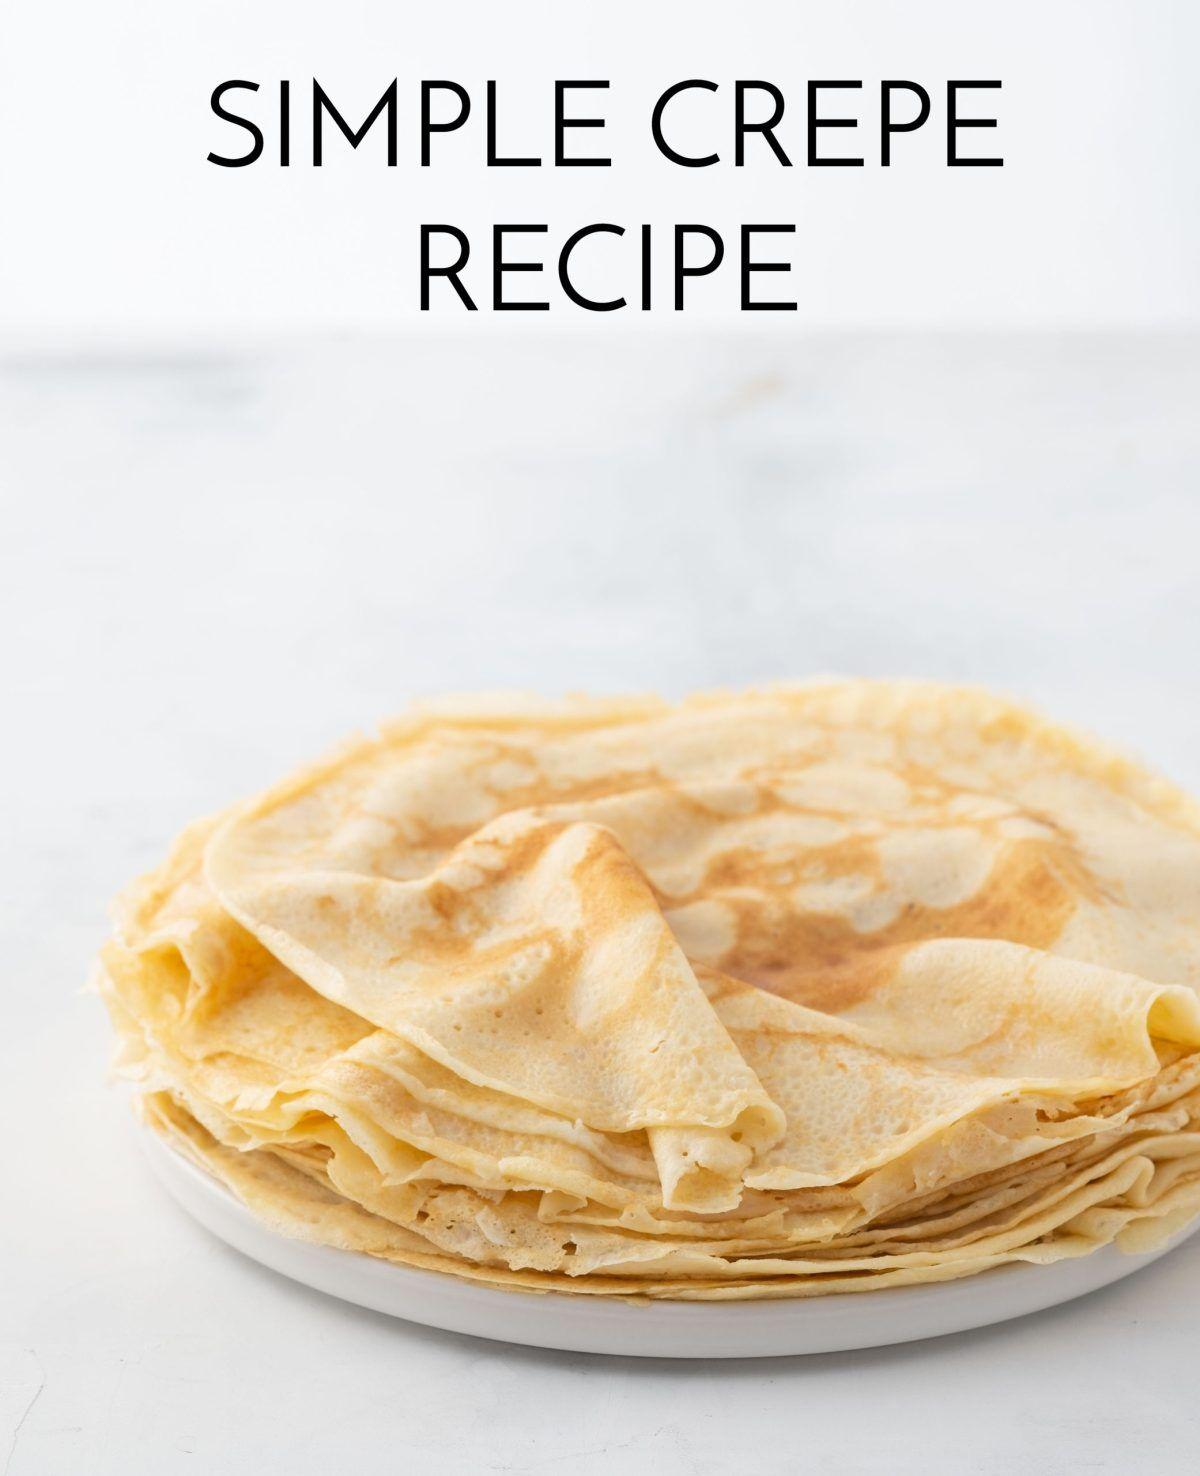 Simple Crepe Recipe Simple Simon And Company Easy Crepe Recipe Homemade Crepes Crapes Recipe